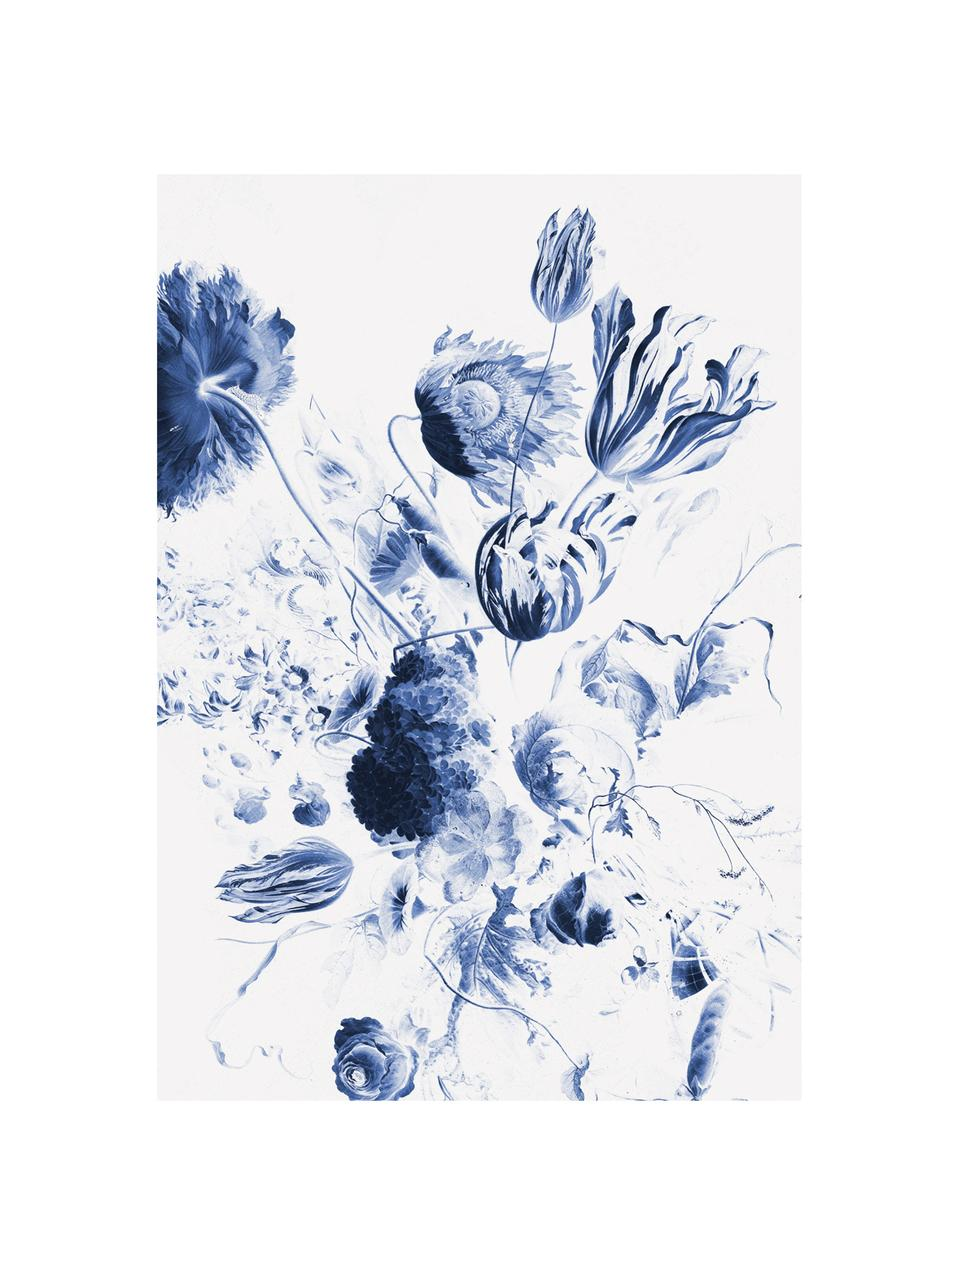 Carta da parati Royal blue Flowers, Tessuto non tessuto, ecologico e biodegradabile, Blu, bianco opaco, Larg. 196 x Alt. 280 cm